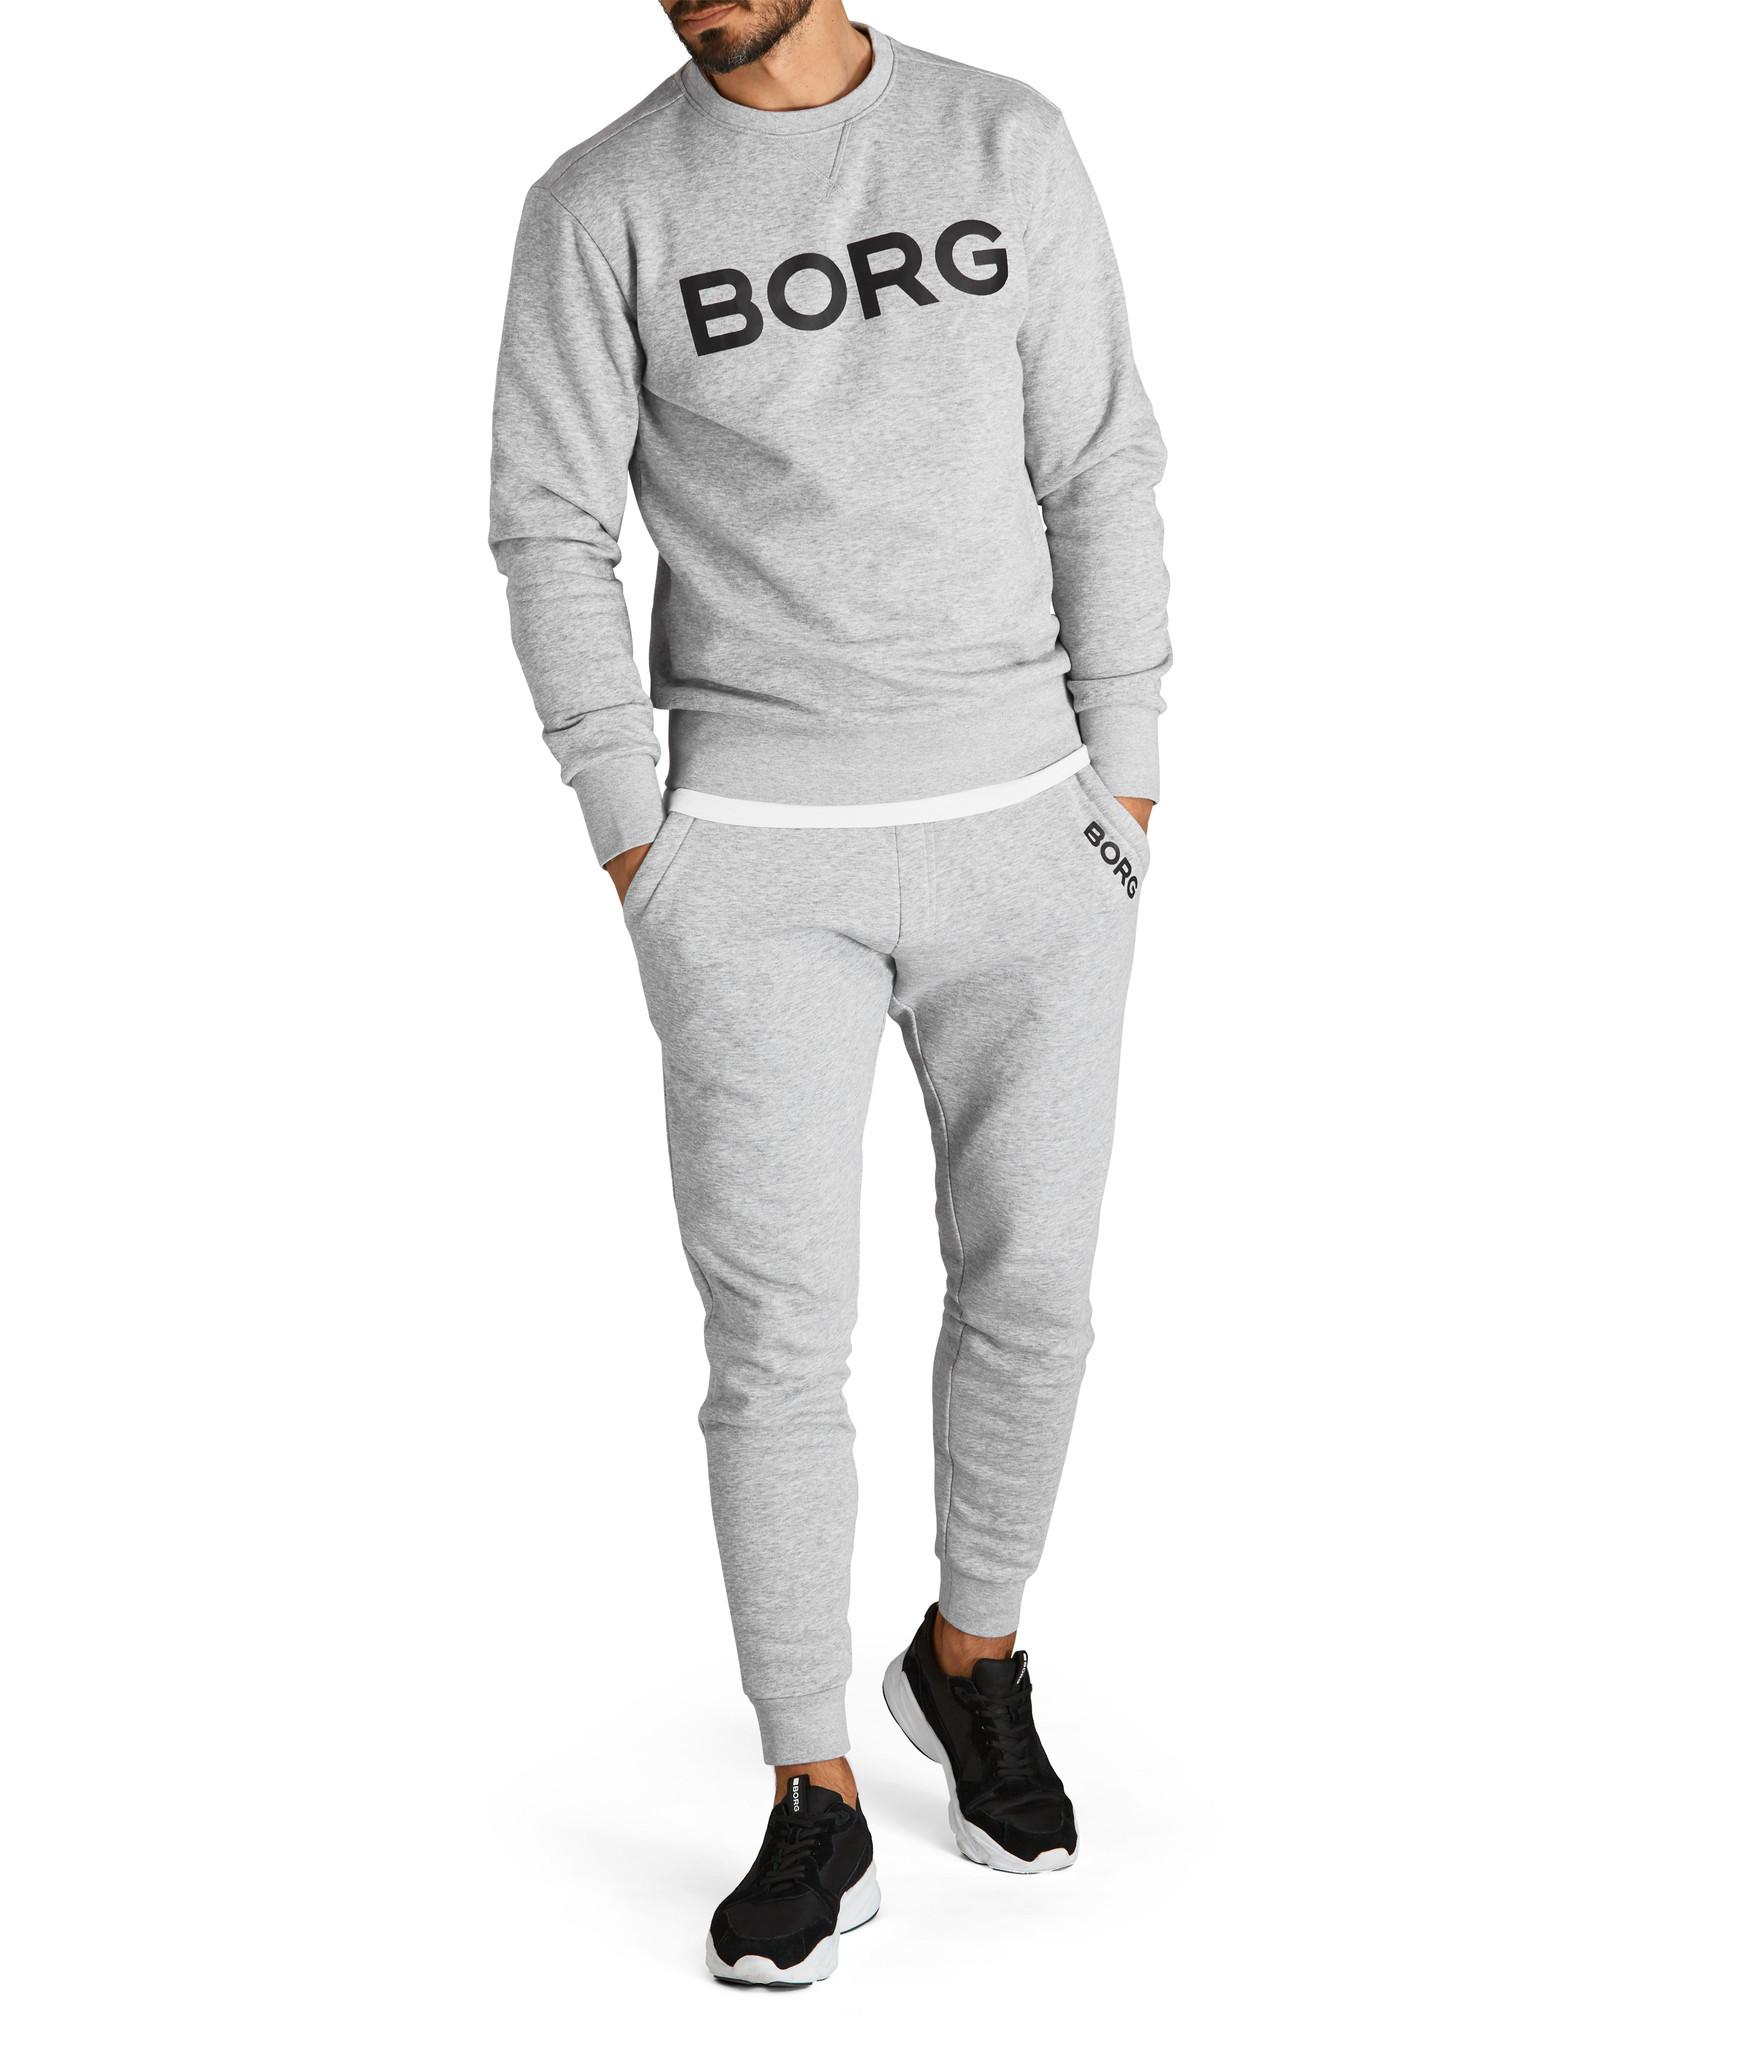 Bjorn Borg Jogging Bjorn Borg 9999-1620-90741